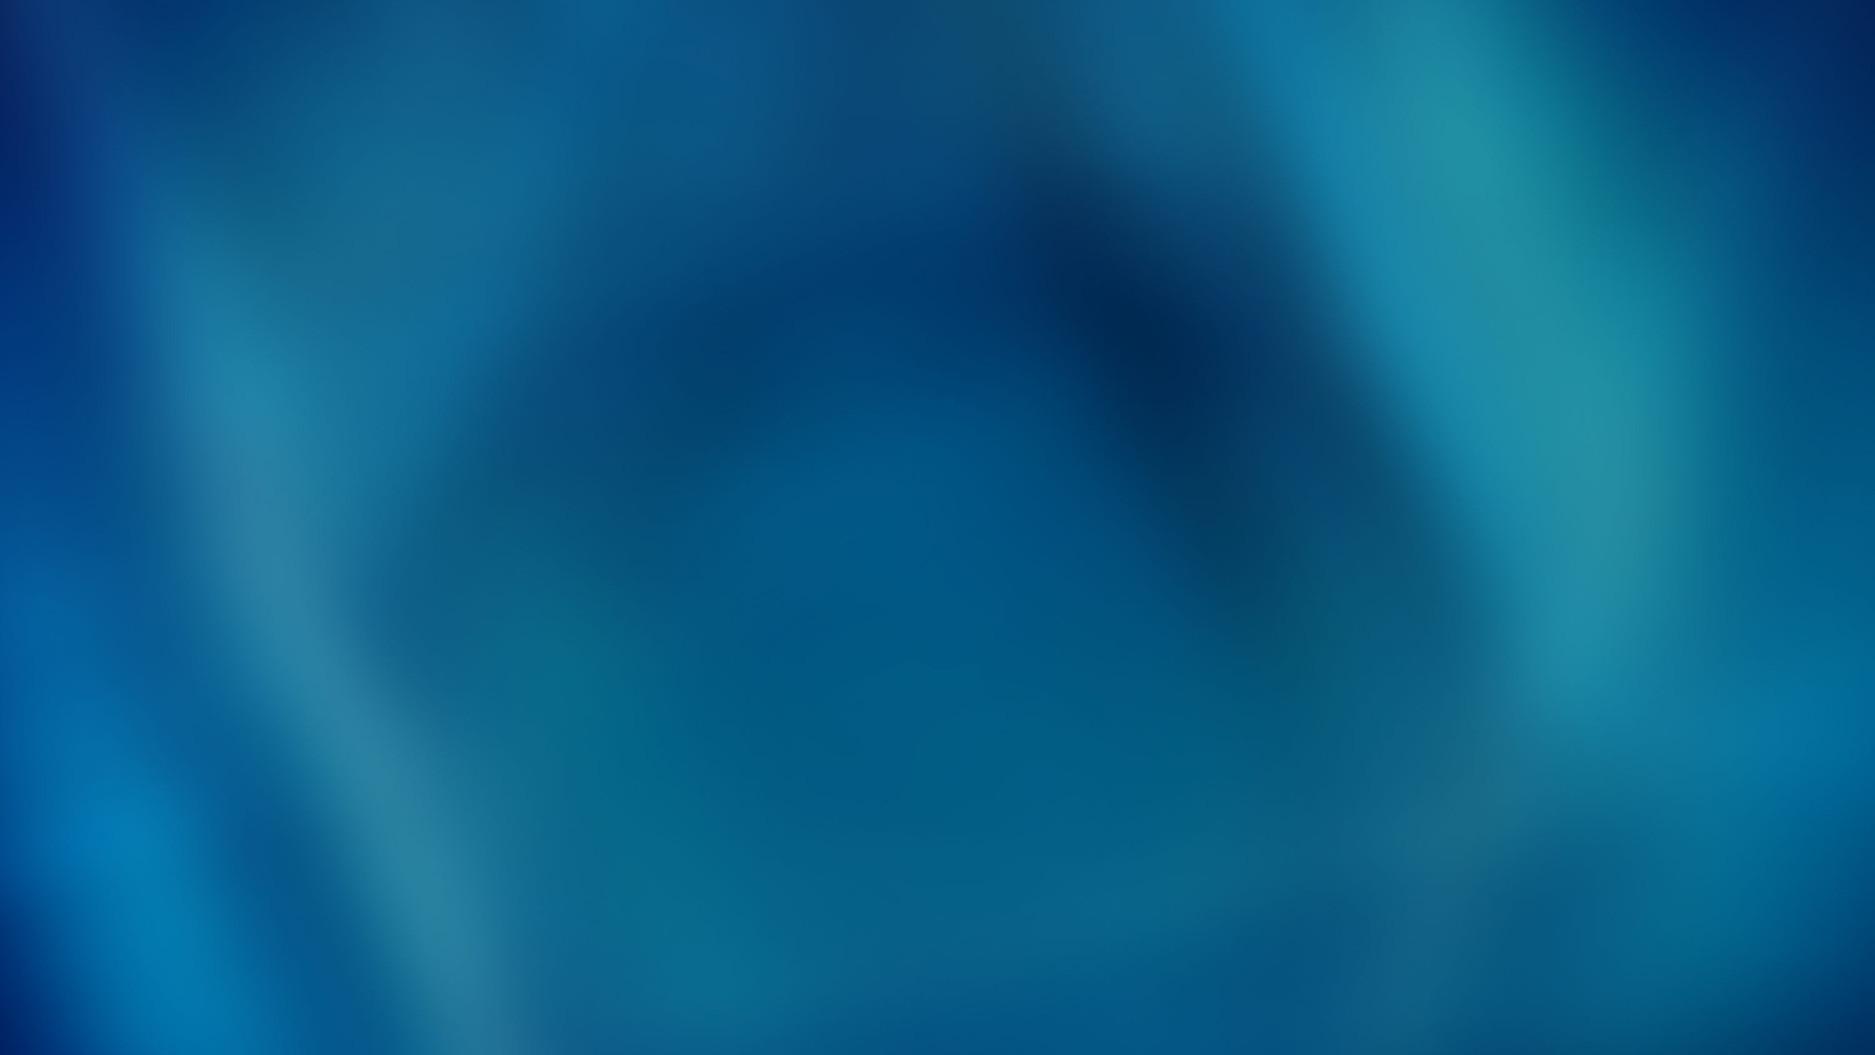 Surface bleu